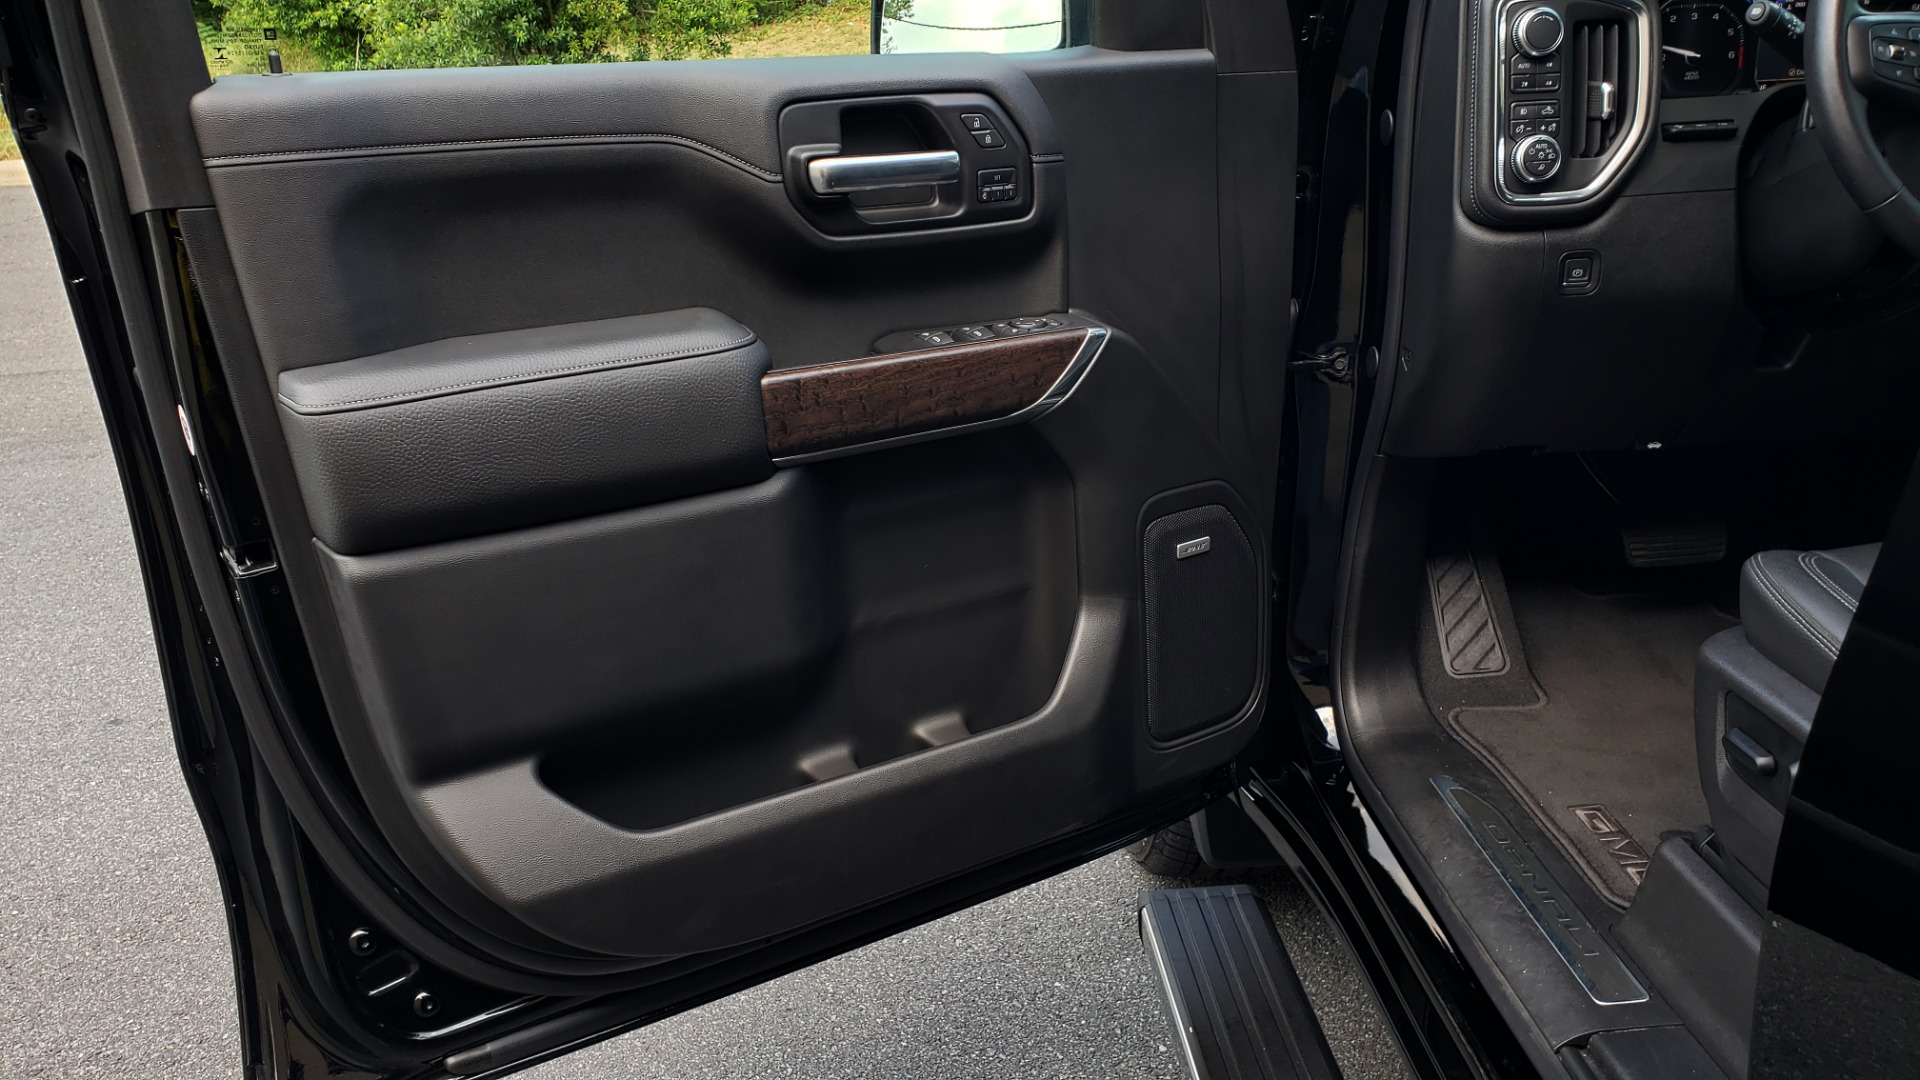 Used 2019 GMC SIERRA 1500 DENALI ULTIMATE 4WD / NAV / TECH PKG / DRVR ALRT for sale Sold at Formula Imports in Charlotte NC 28227 40